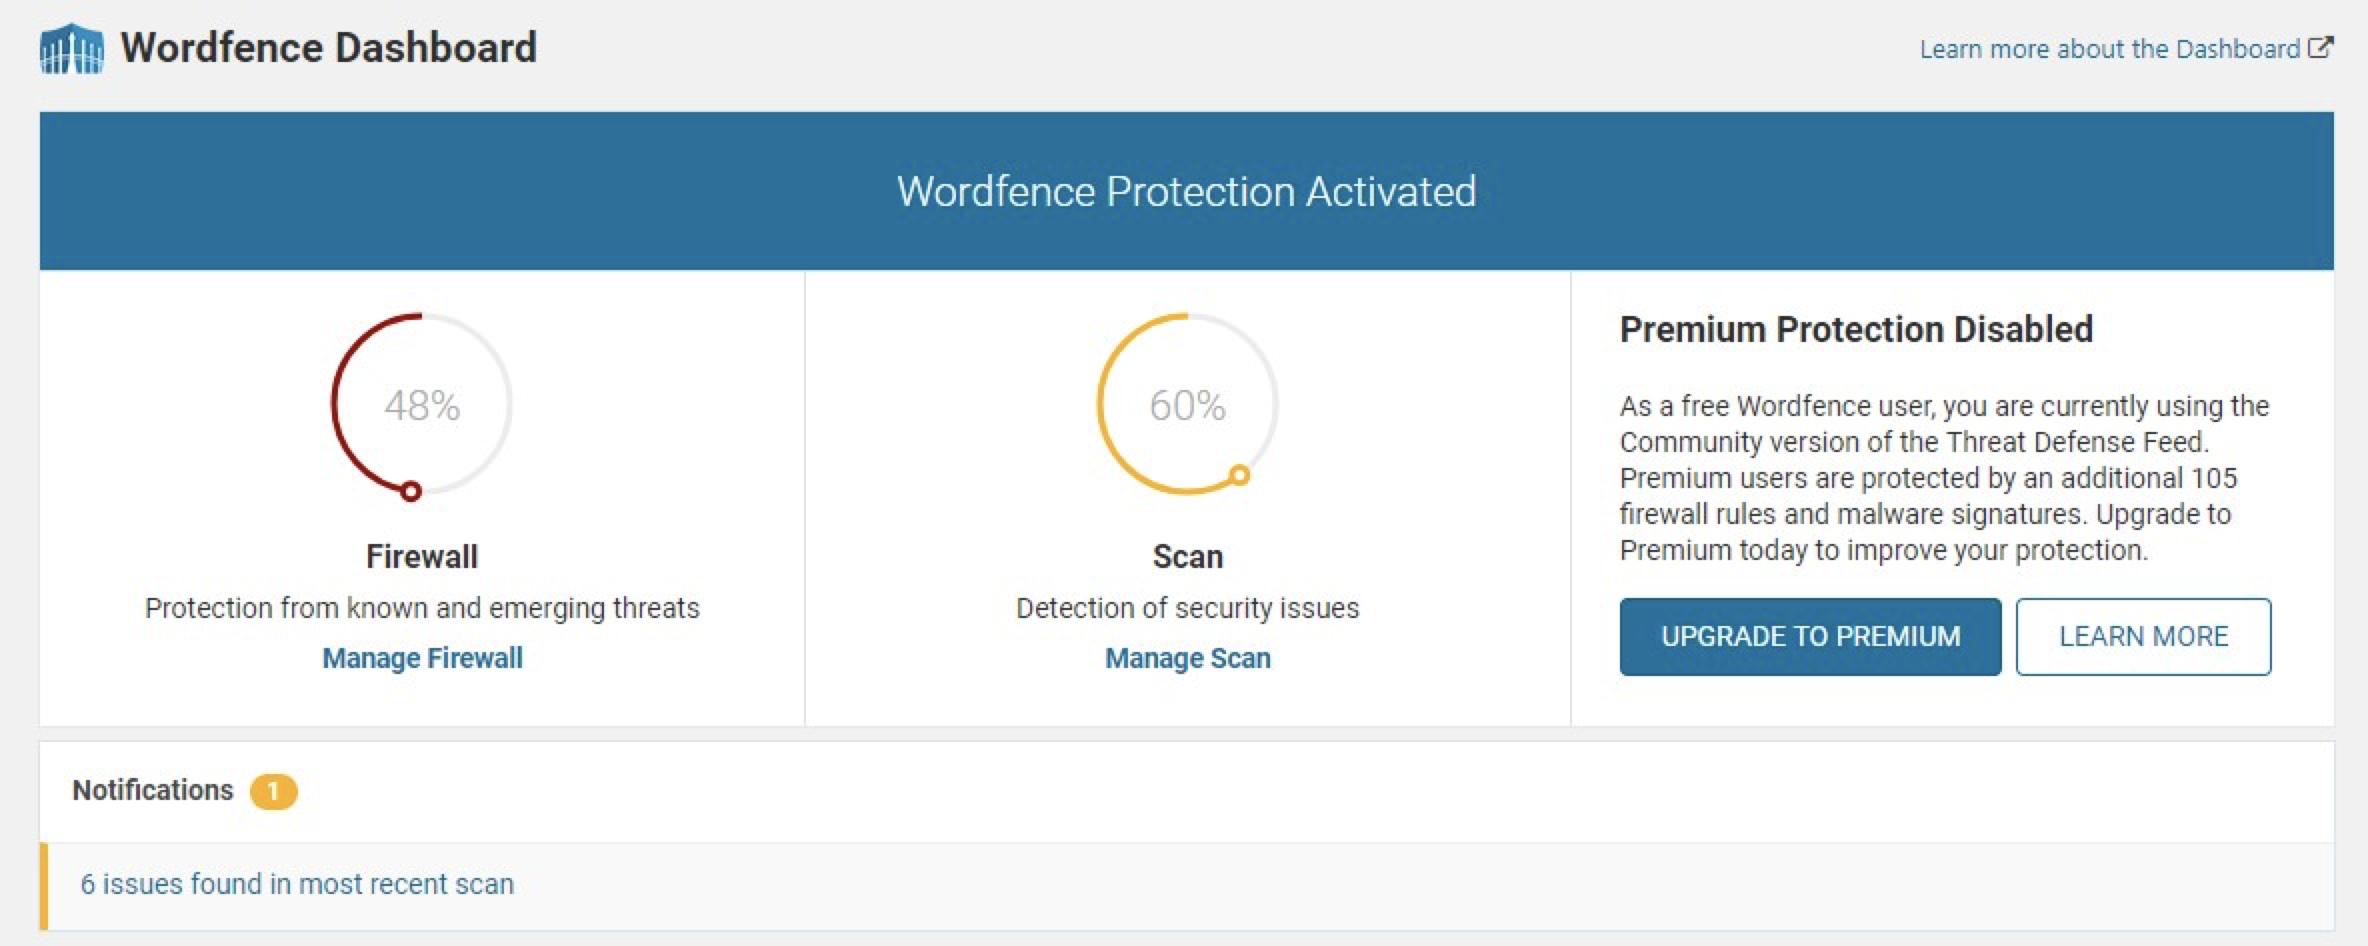 Wordfence dashboard